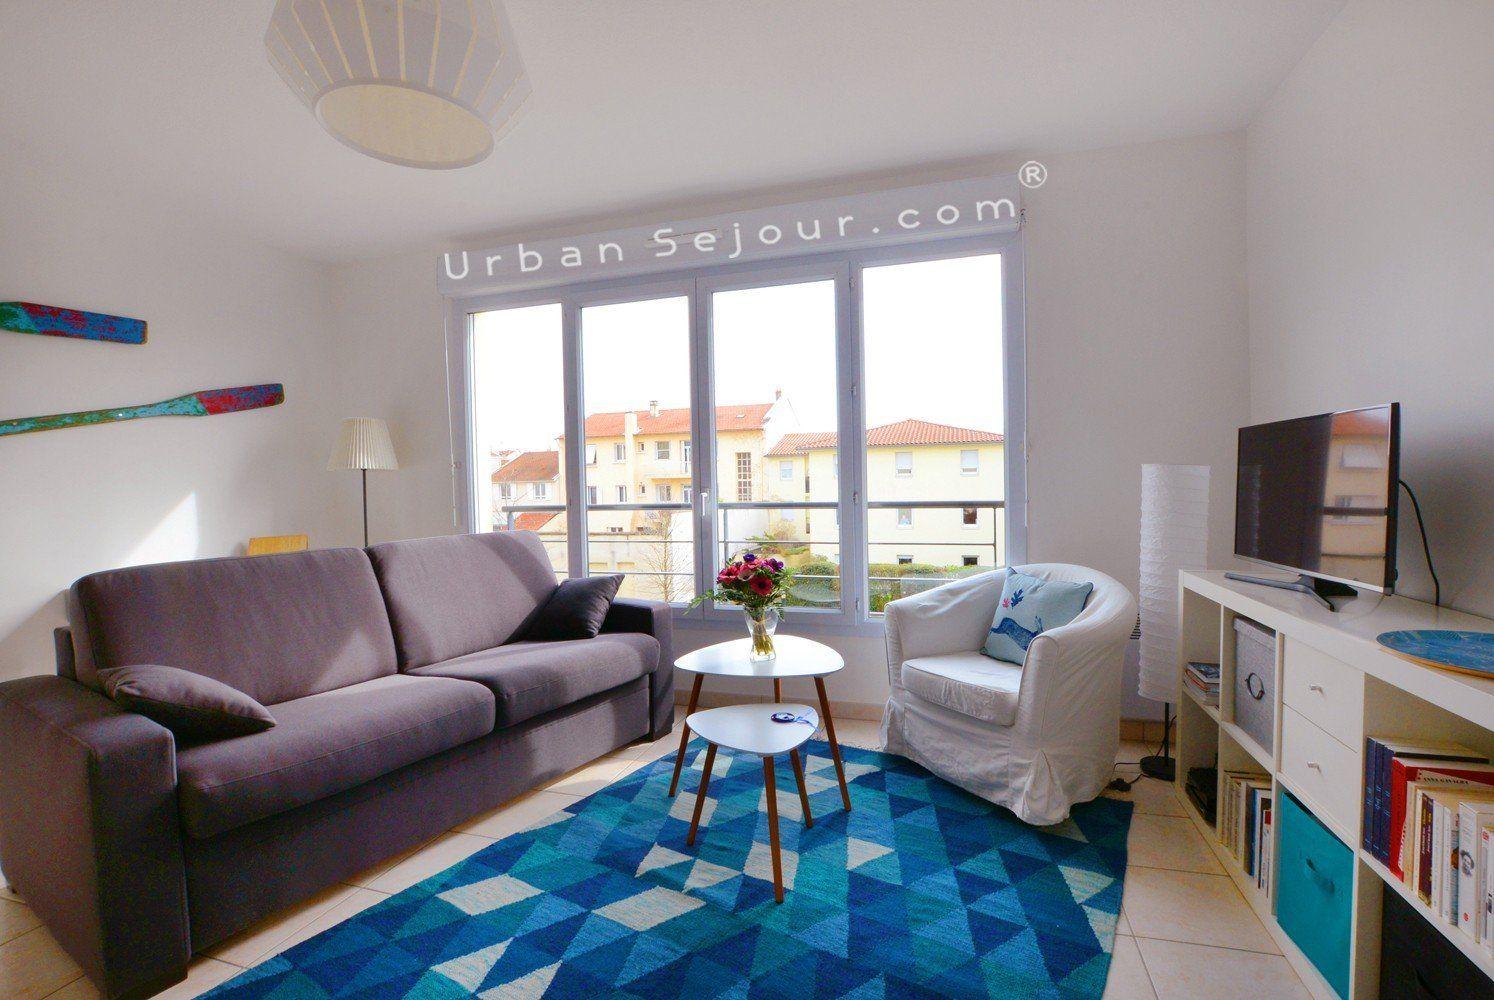 Location appartement avec 1 chambre location saisonni re for Location appartement meuble a lyon